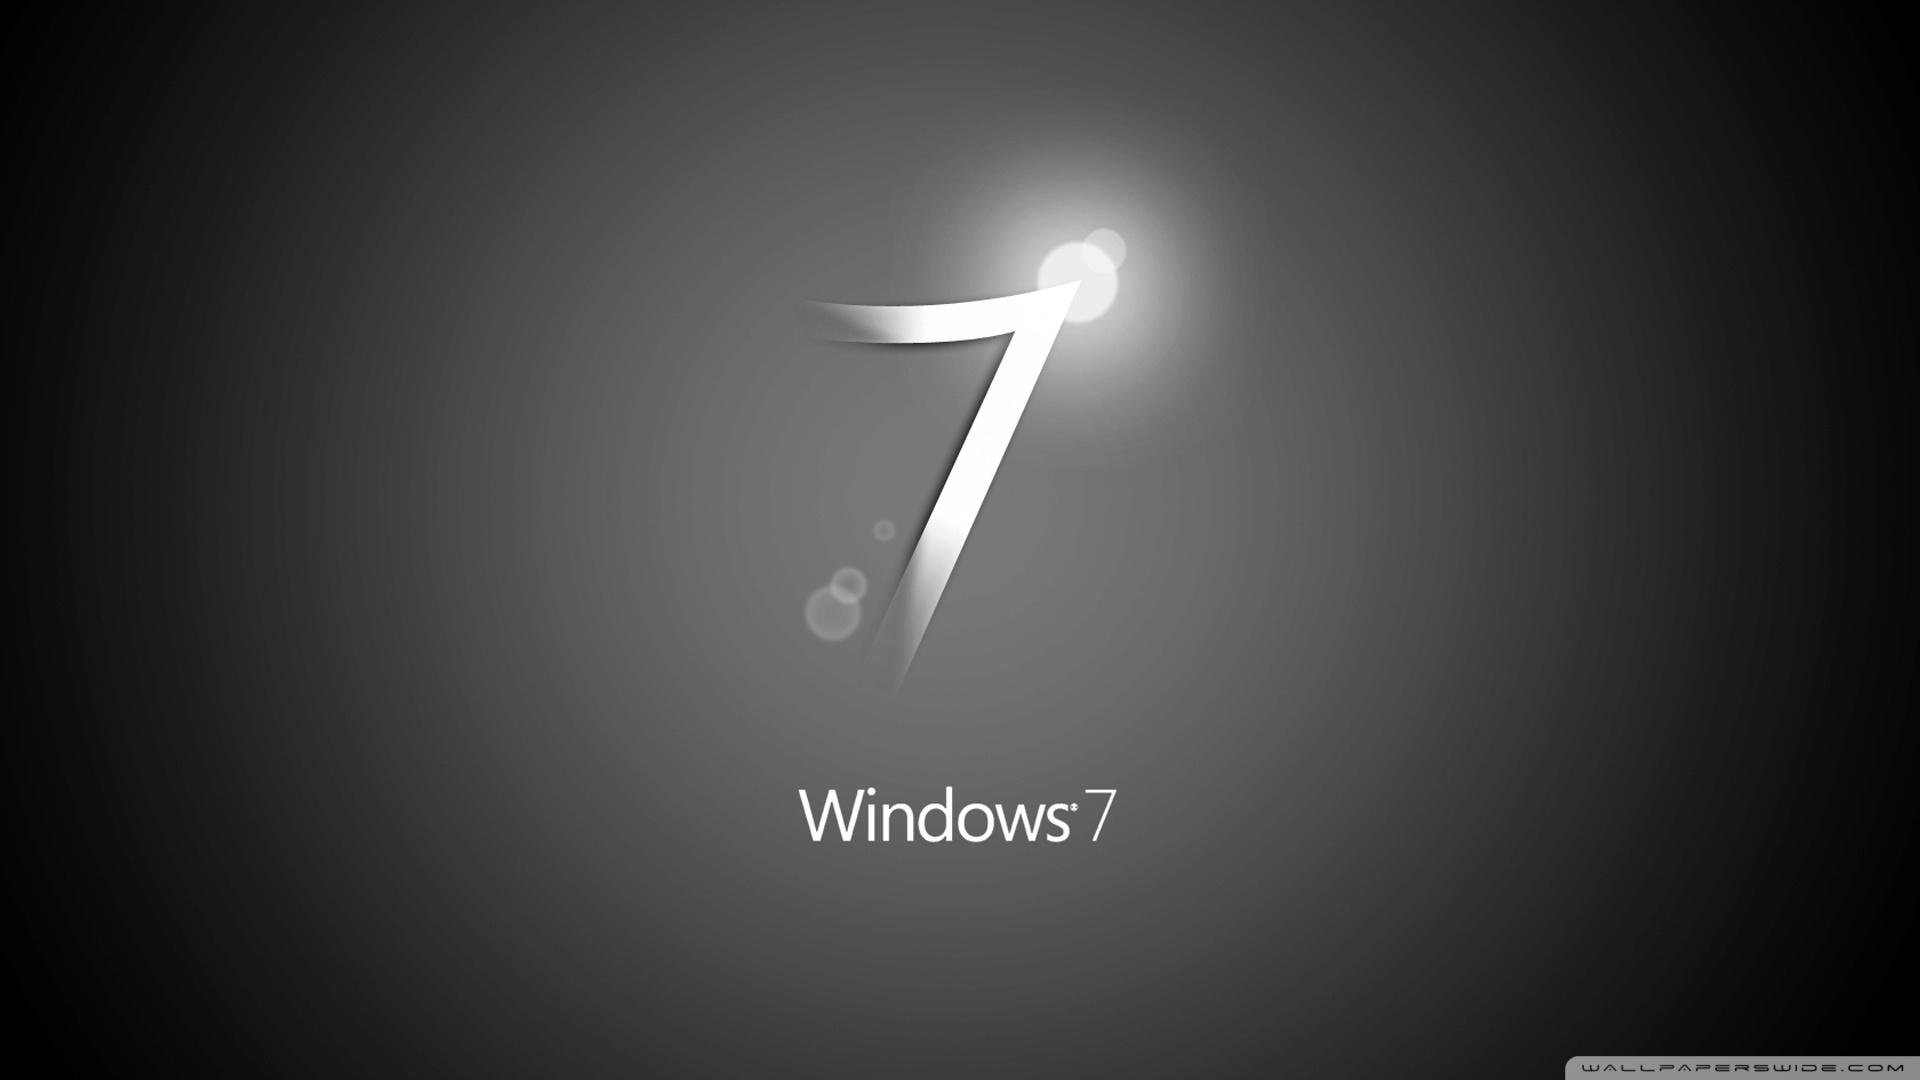 Image Details Source Wallpaperswide Title Windows 7 Black 4k Hd Desktop Wallpaper For Ultra Tv O Wide Dimension 1920 X 1080